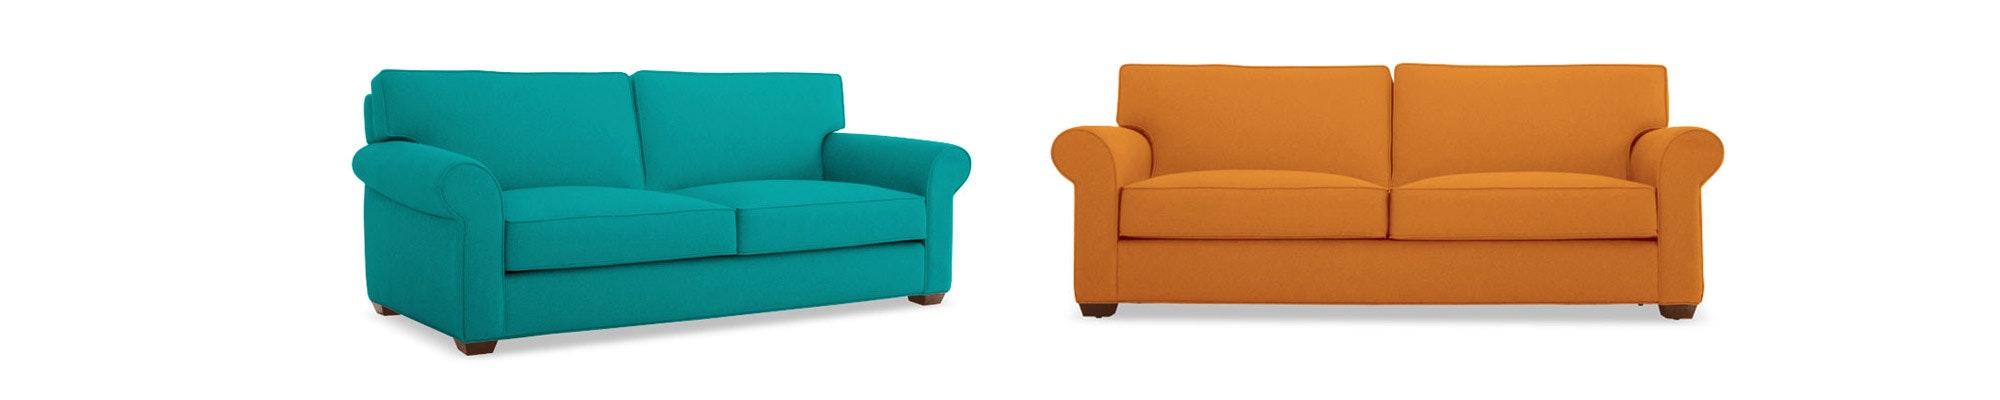 Leo Leather Sofa Joybird